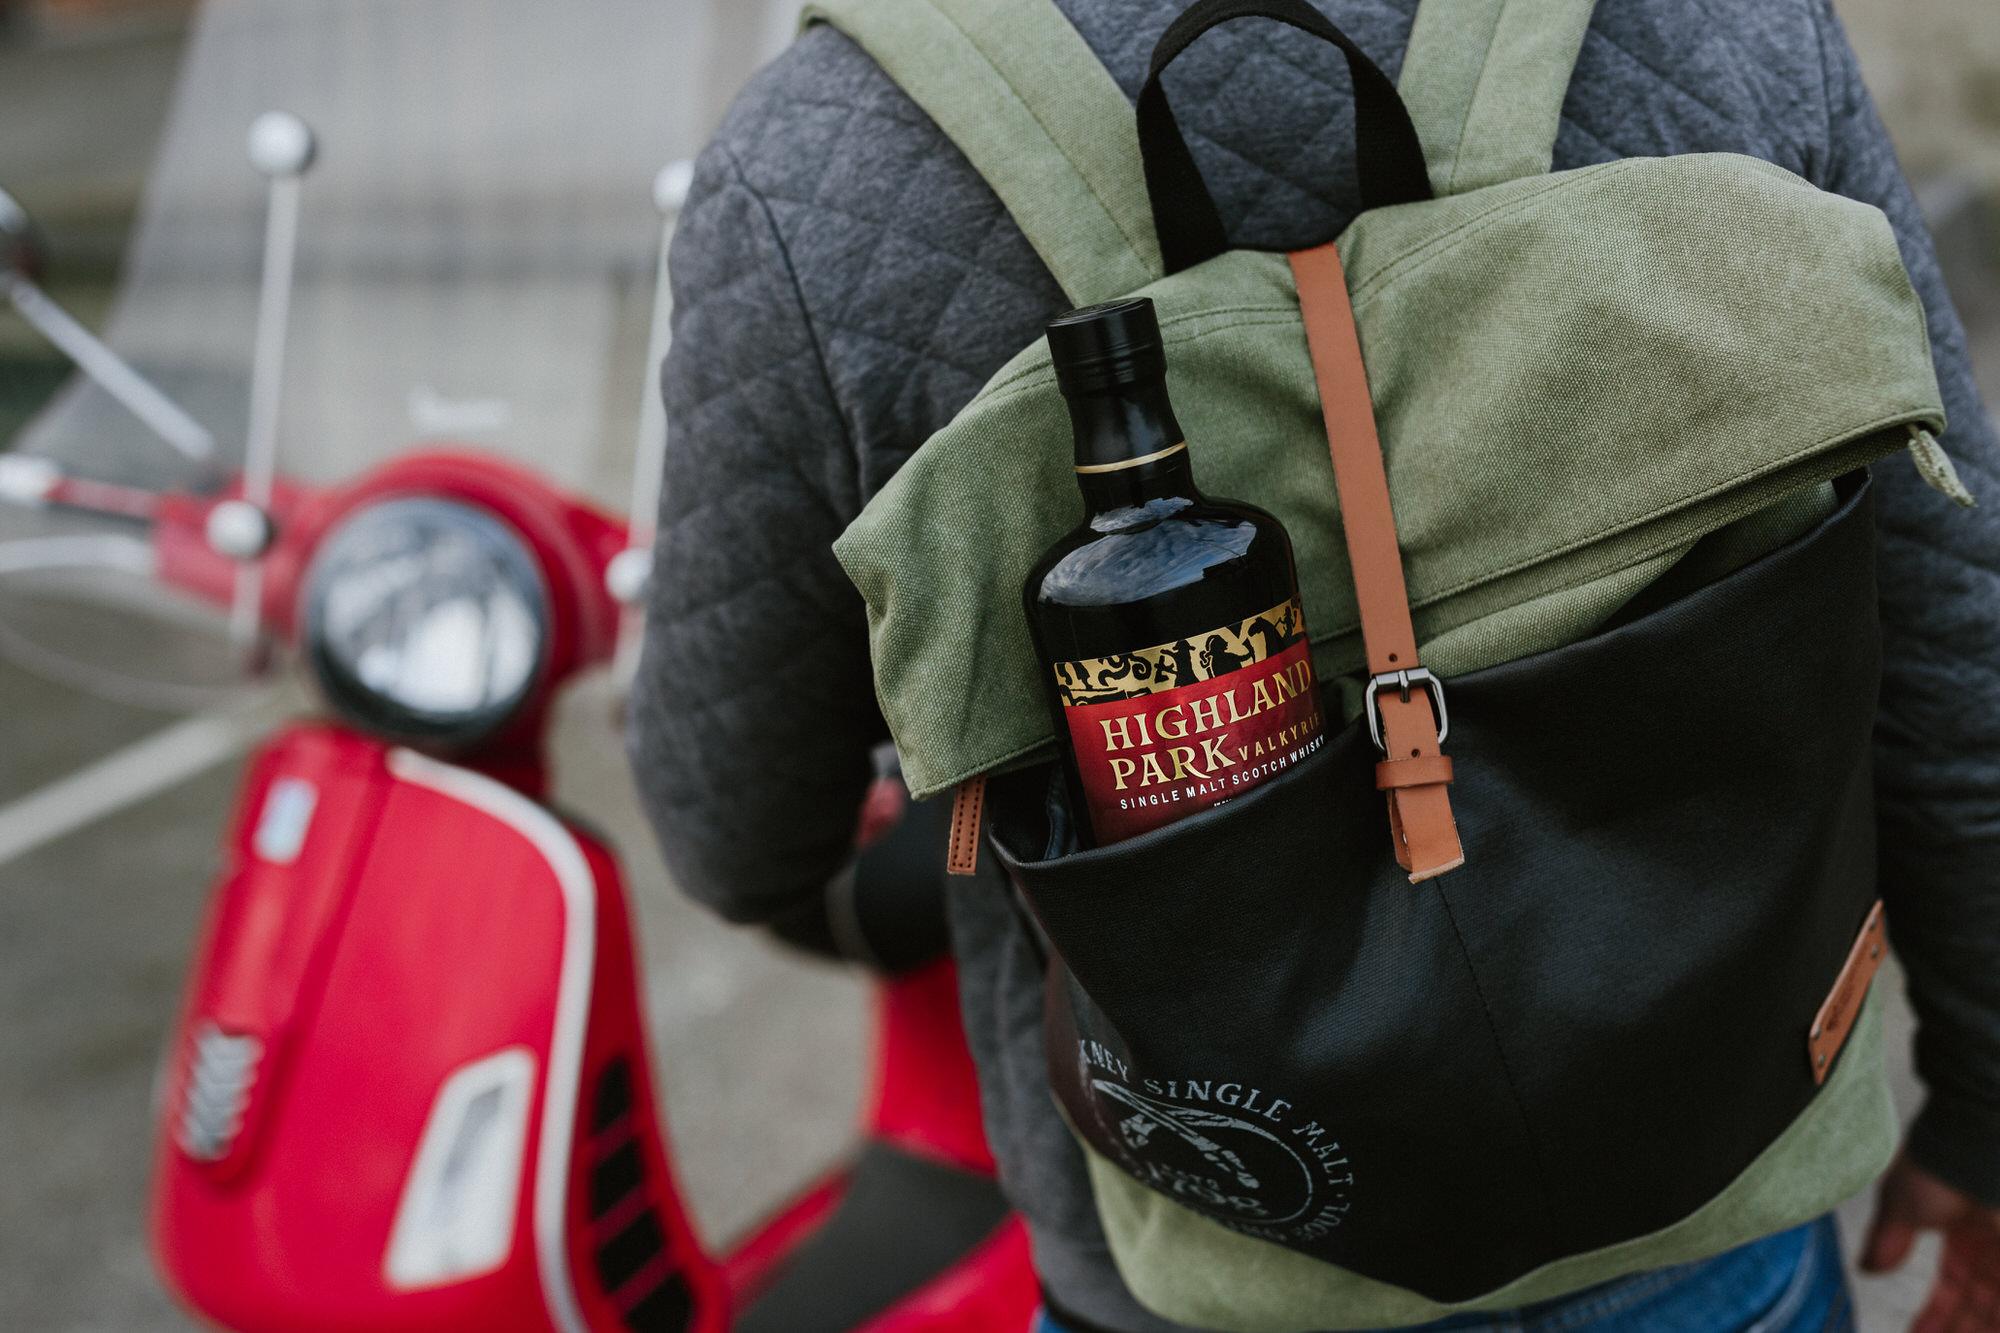 highland-park-valkyrie-urban-product-photography-glasgow-walnut-wasp-copenhagen-merch-bag.jpg